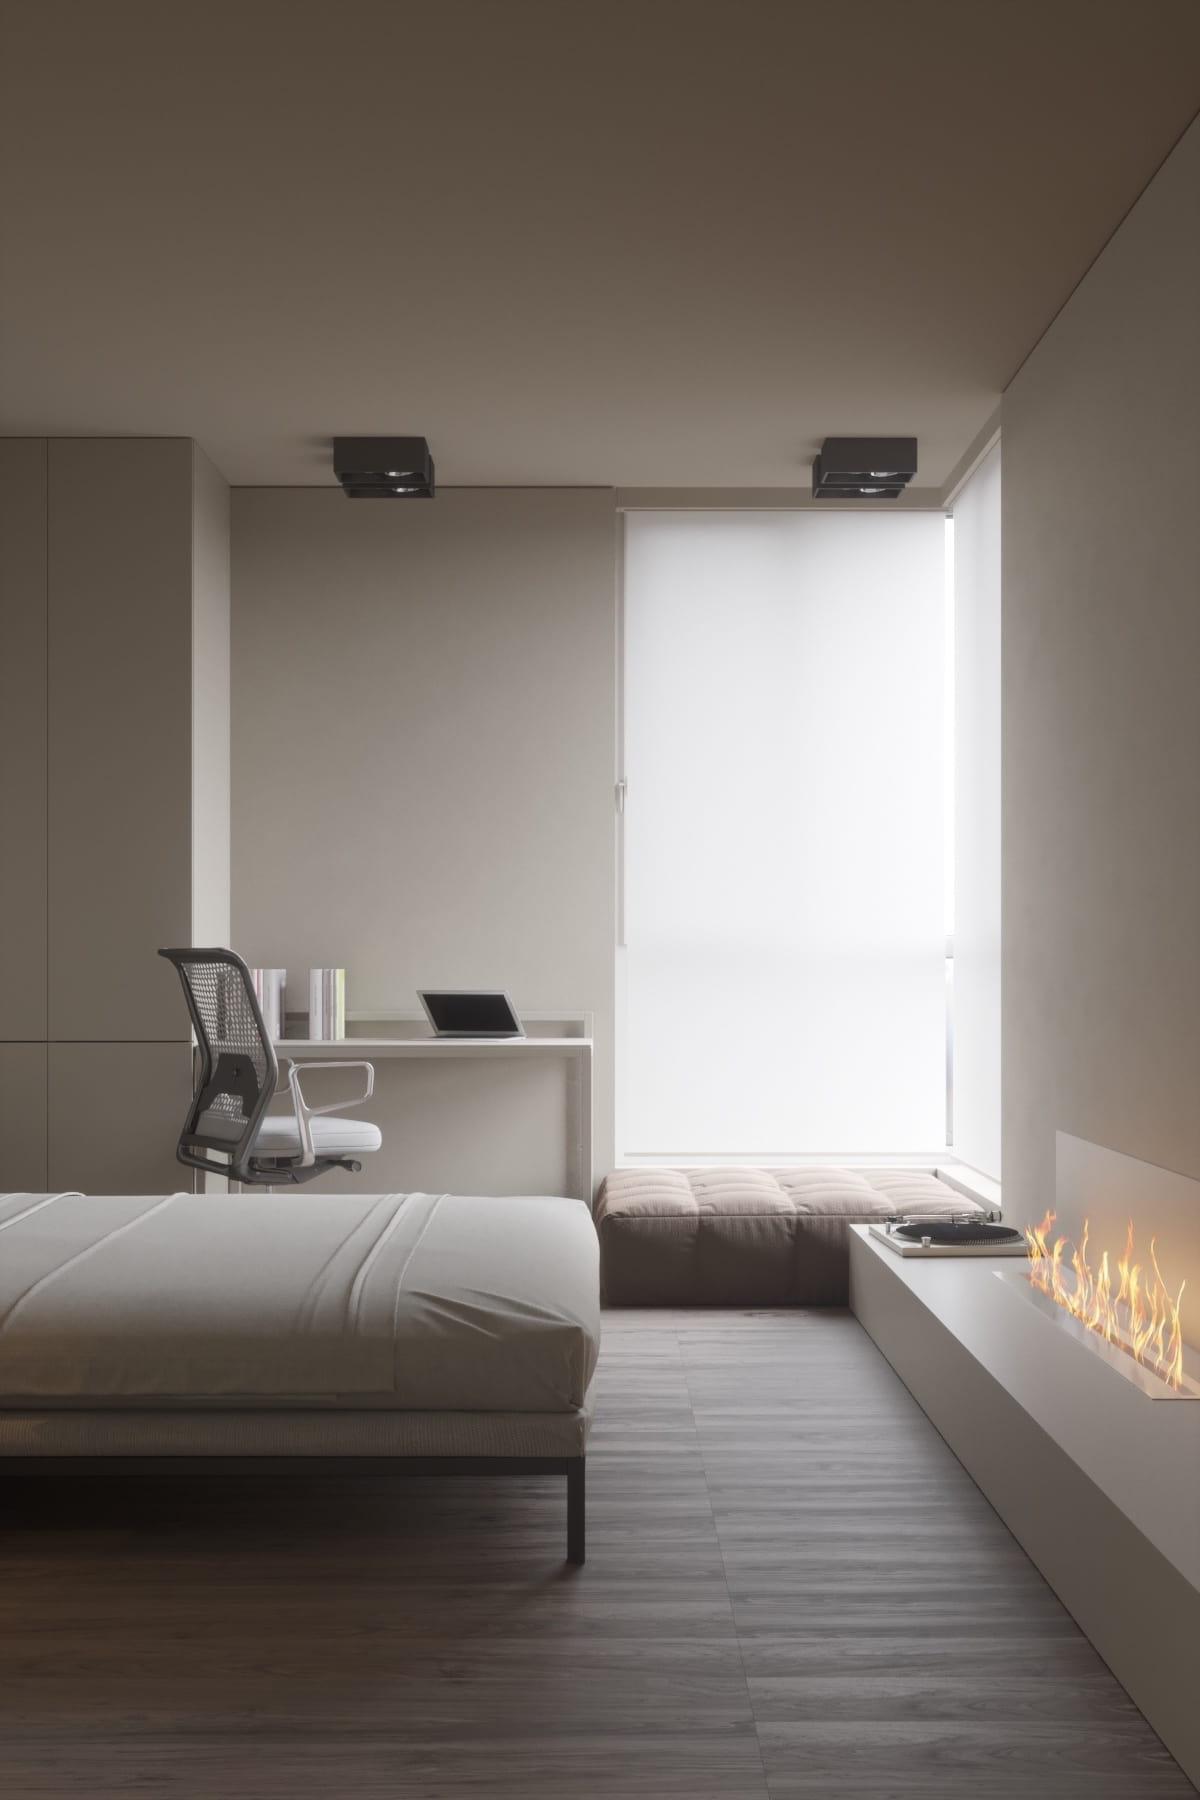 chambre à coucher style minimalisme